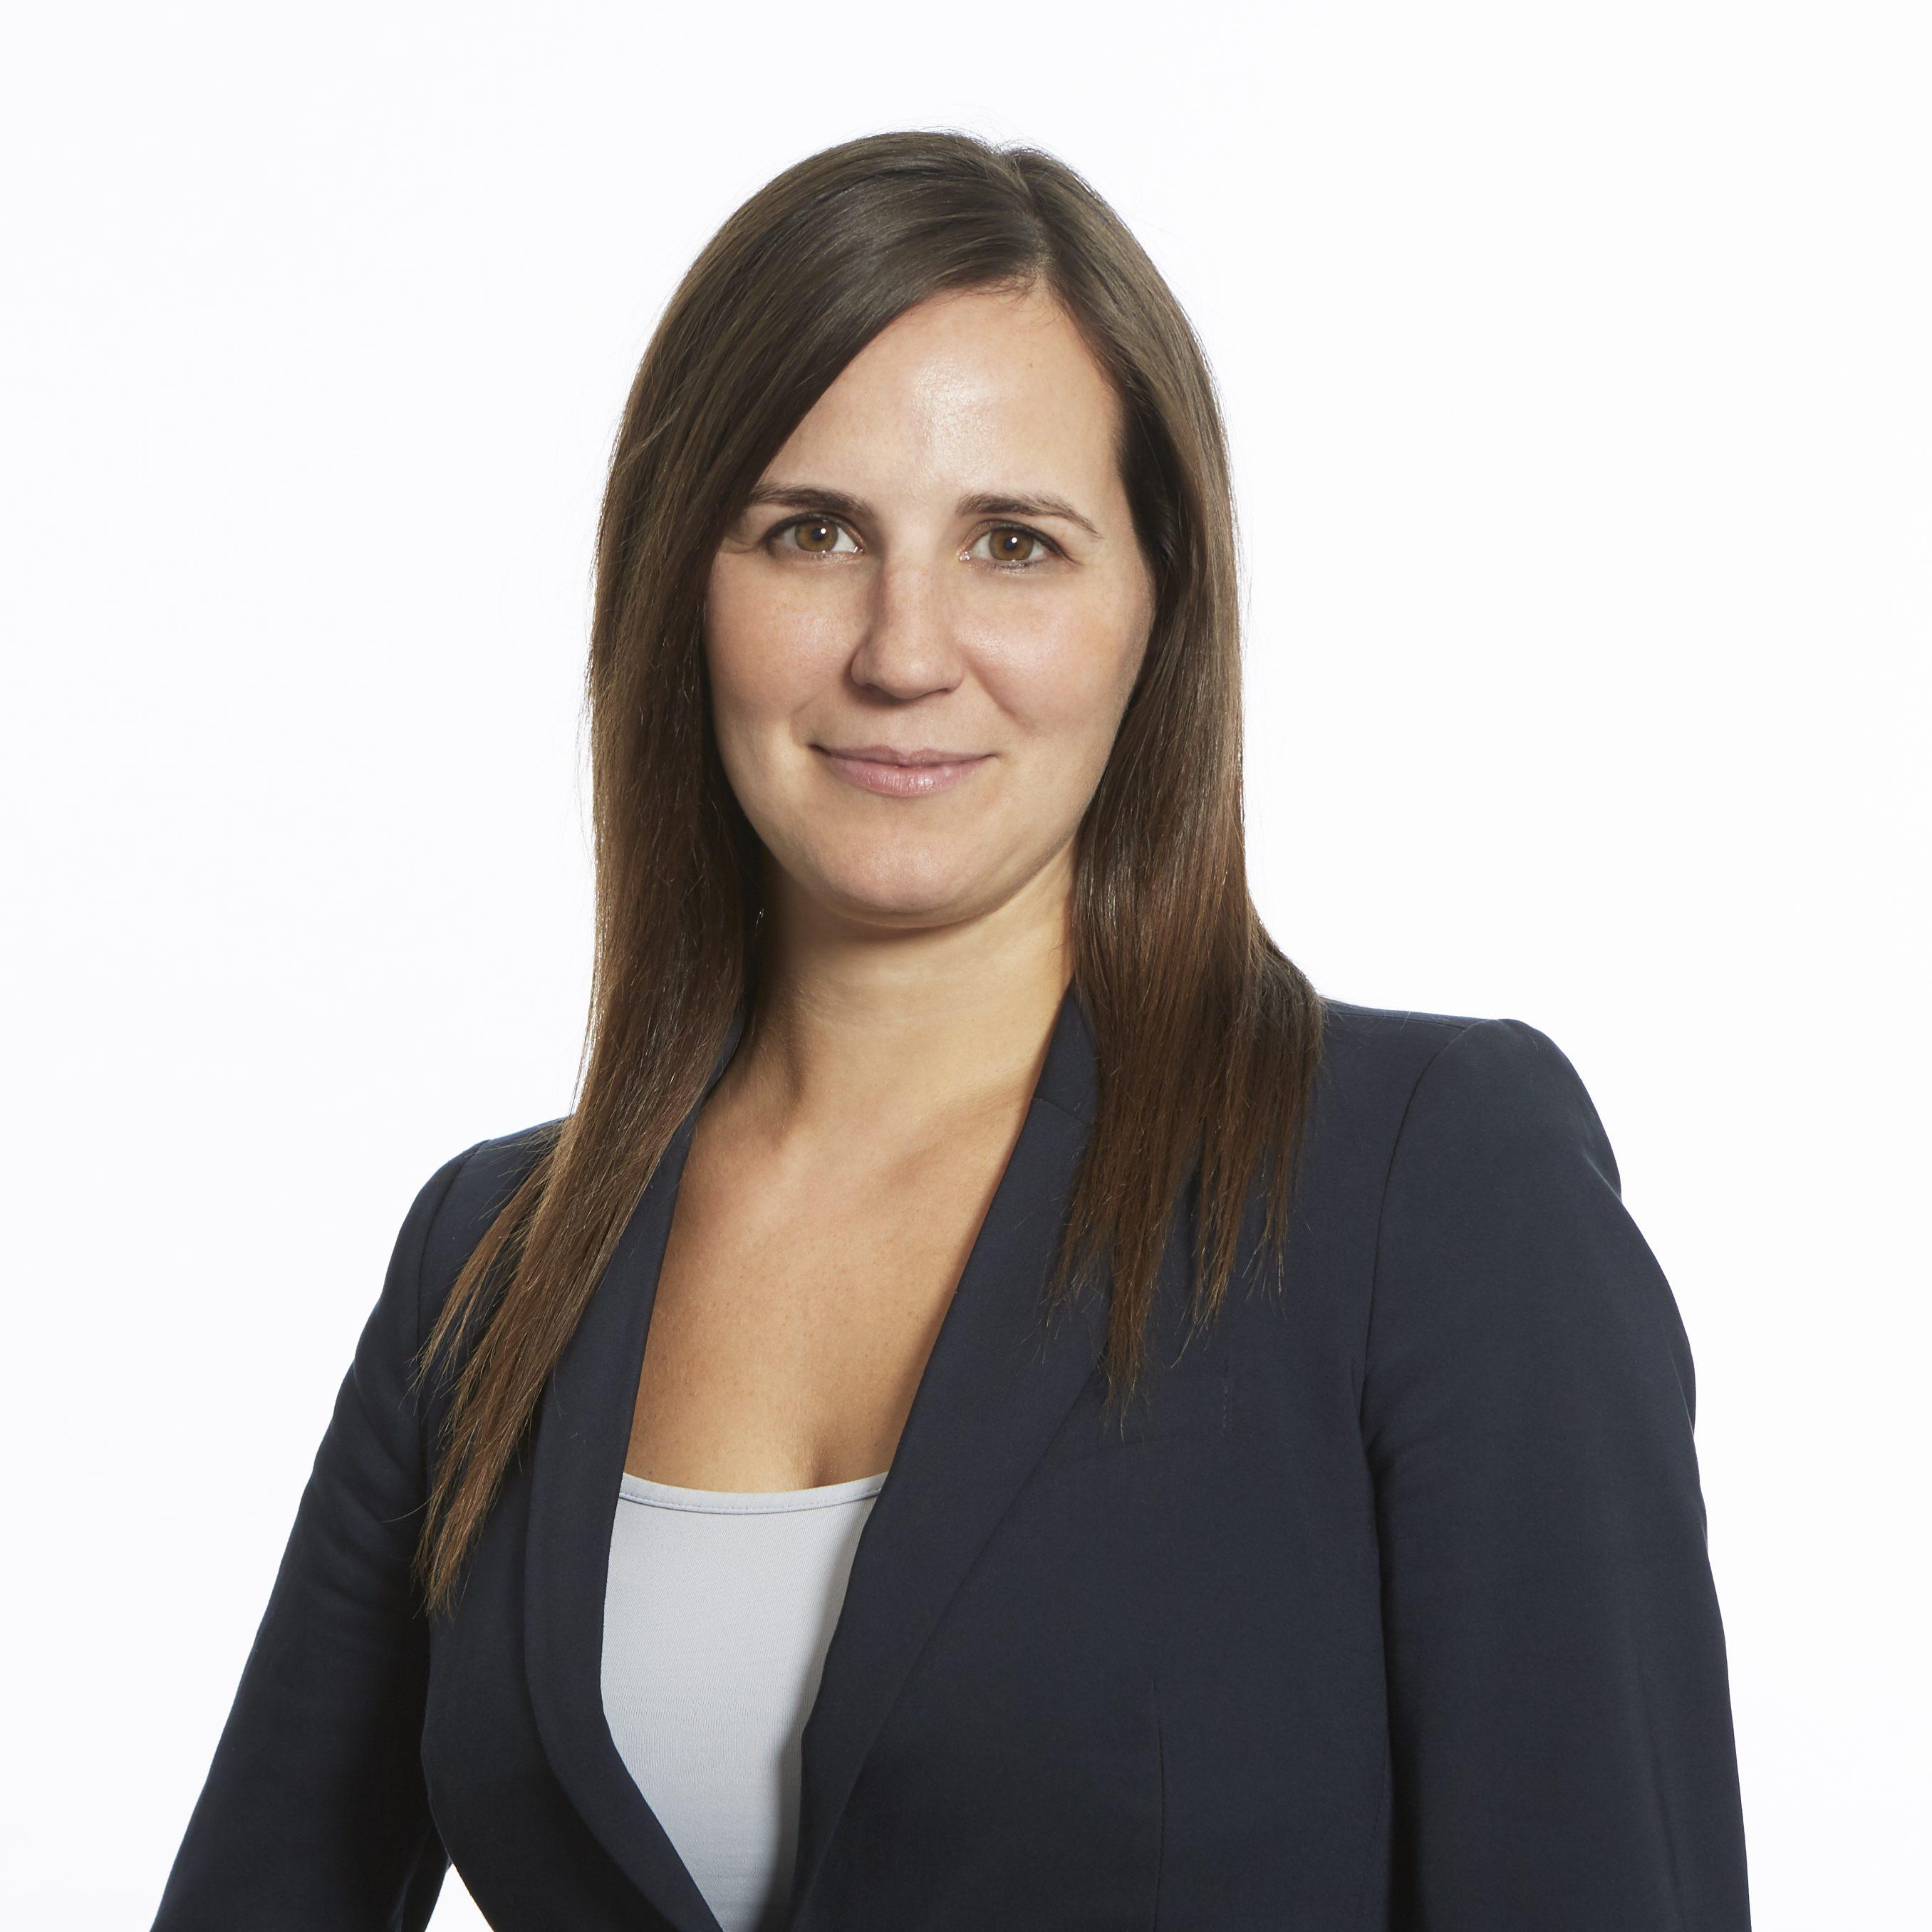 Mariana MacIntosh